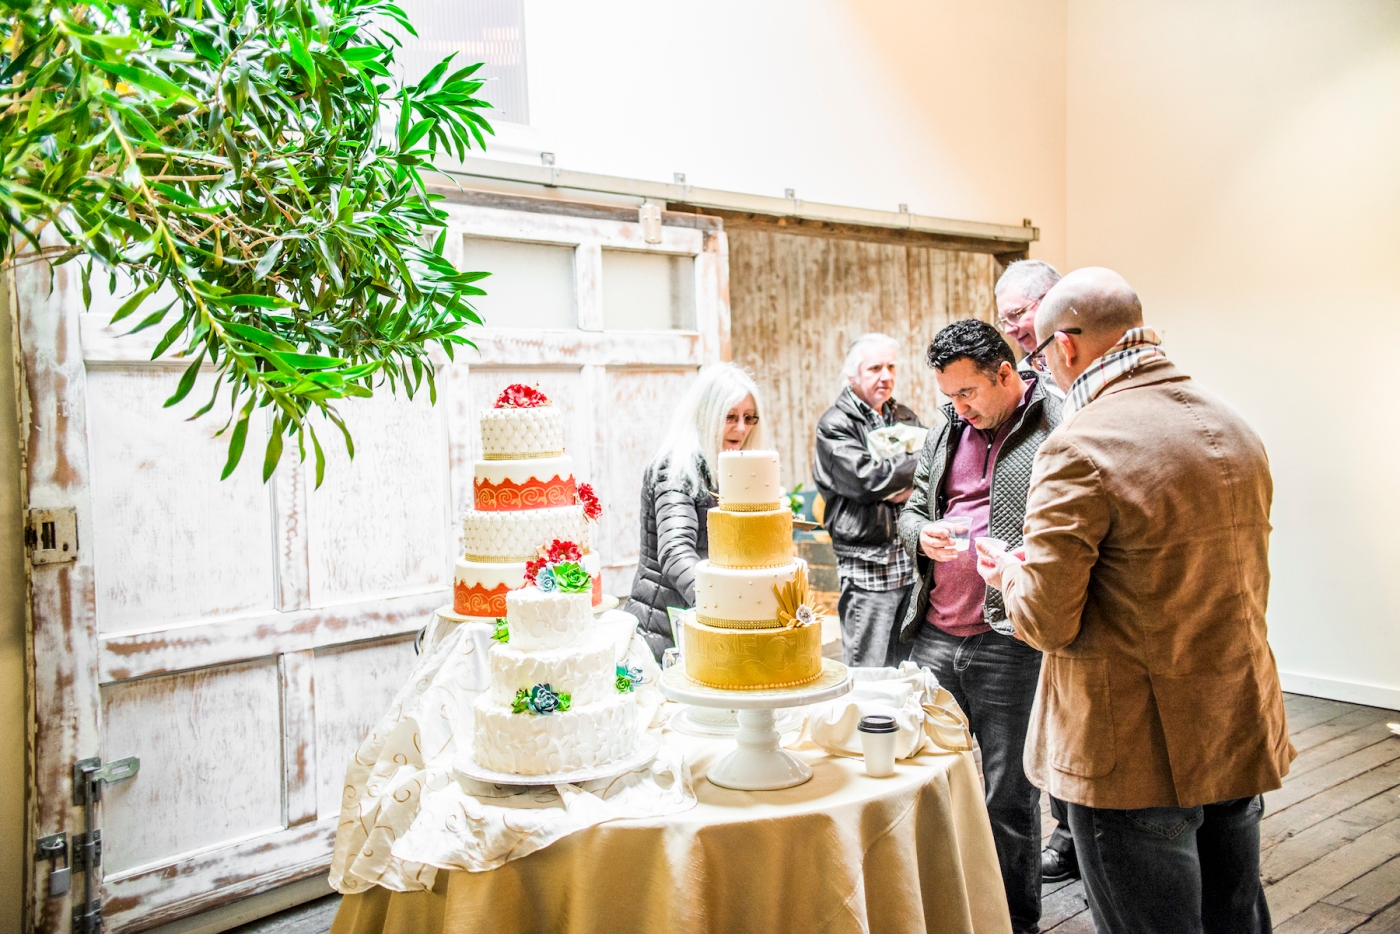 photography_by_jane_speleers_2017_wedding_show_i_do_sodo_within_designed_by_melody_davisdsc_0532